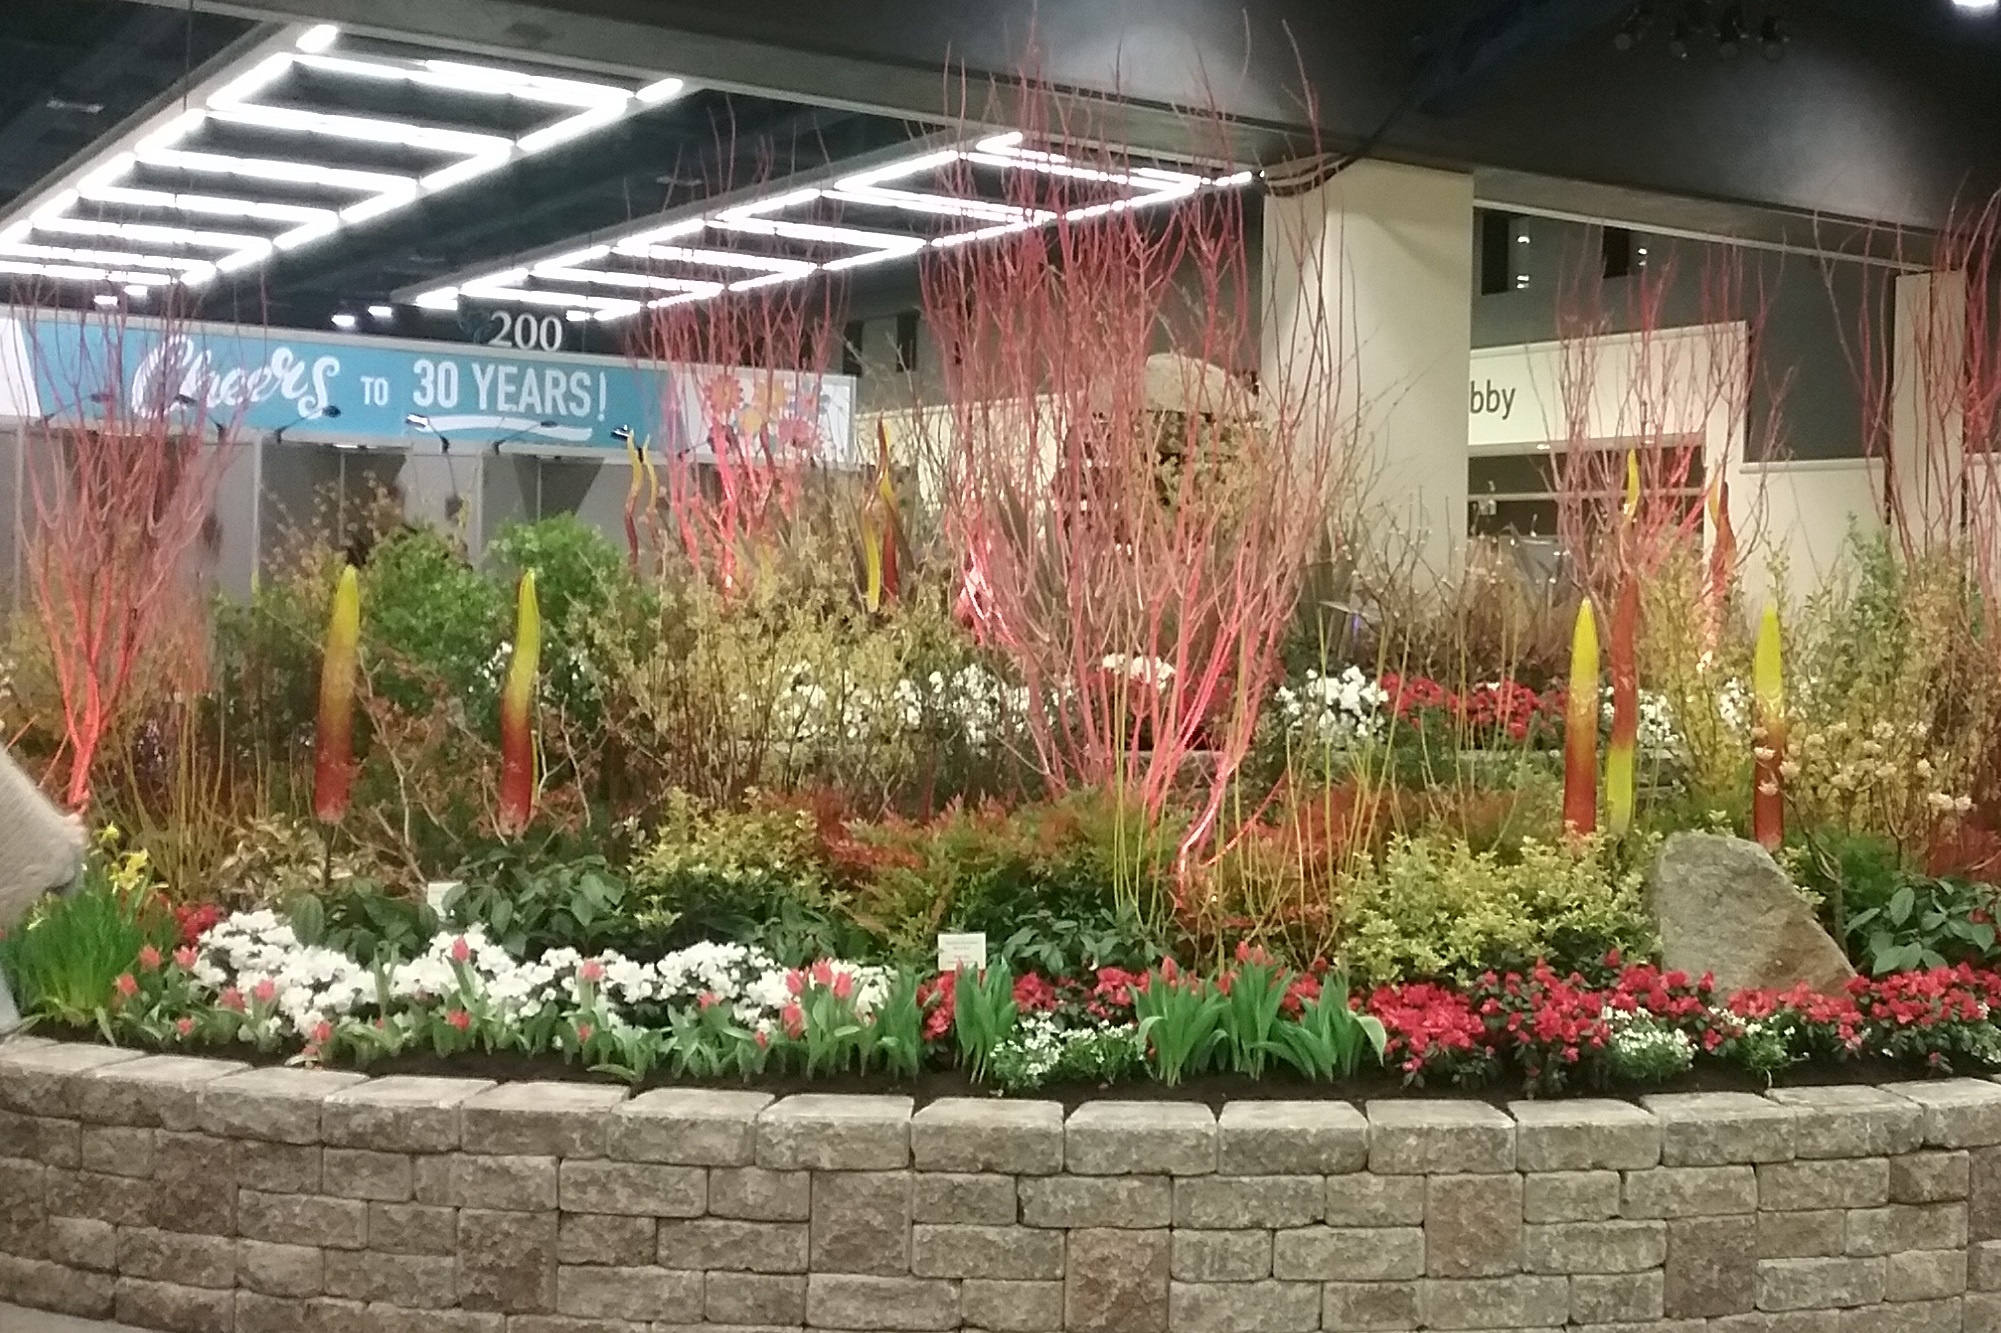 northwest flower & garden show in seattle - greater seattle on the cheap